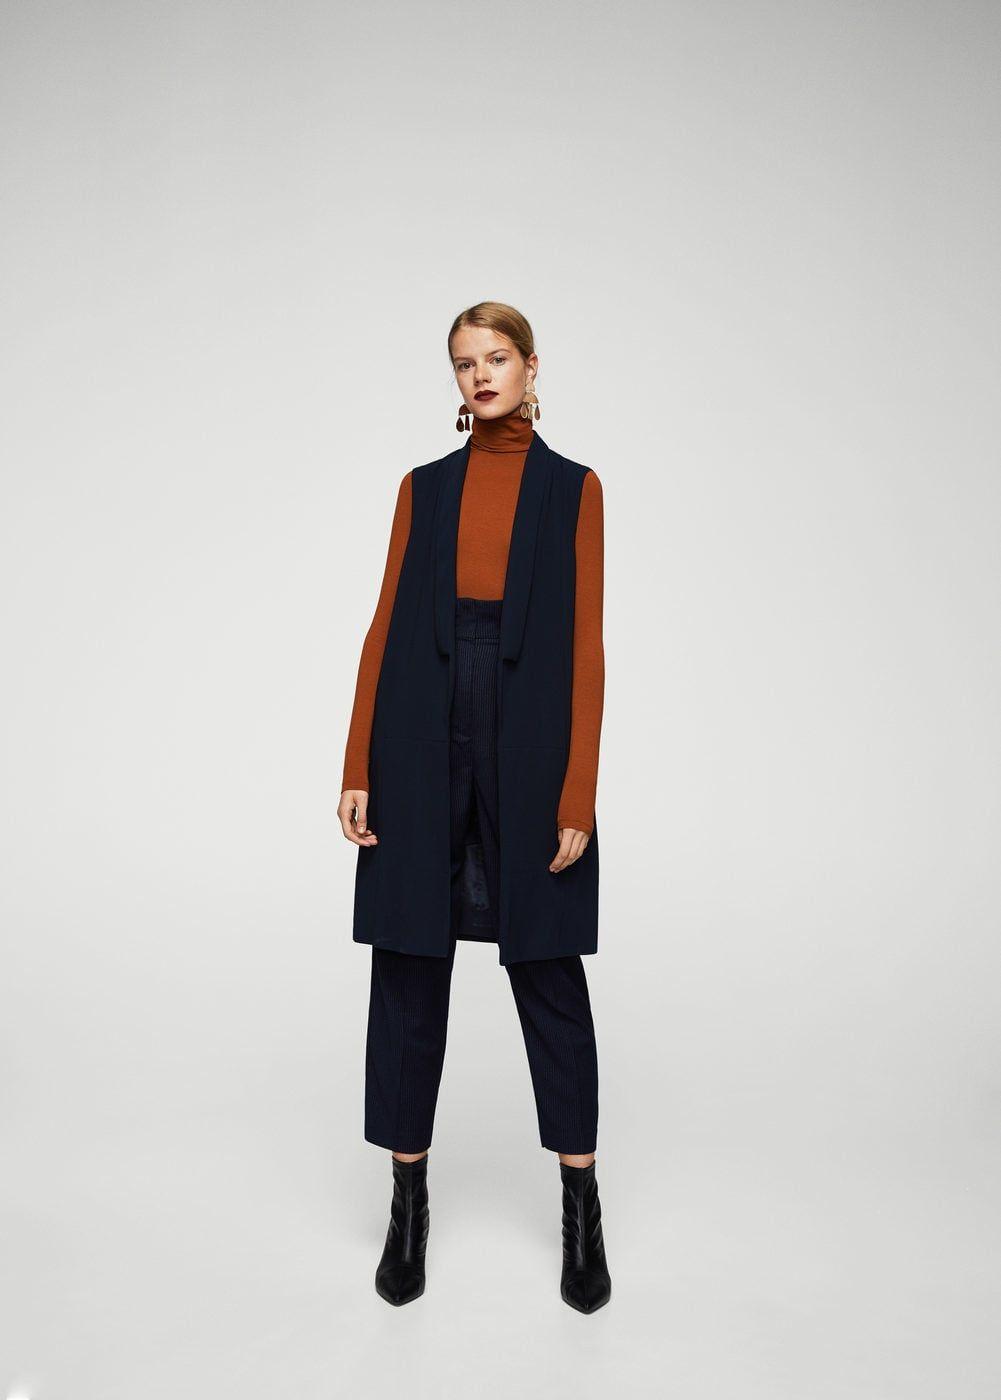 Mango Sleeveless Blazer Outfit Workwear Fashion Long Vest Outfit